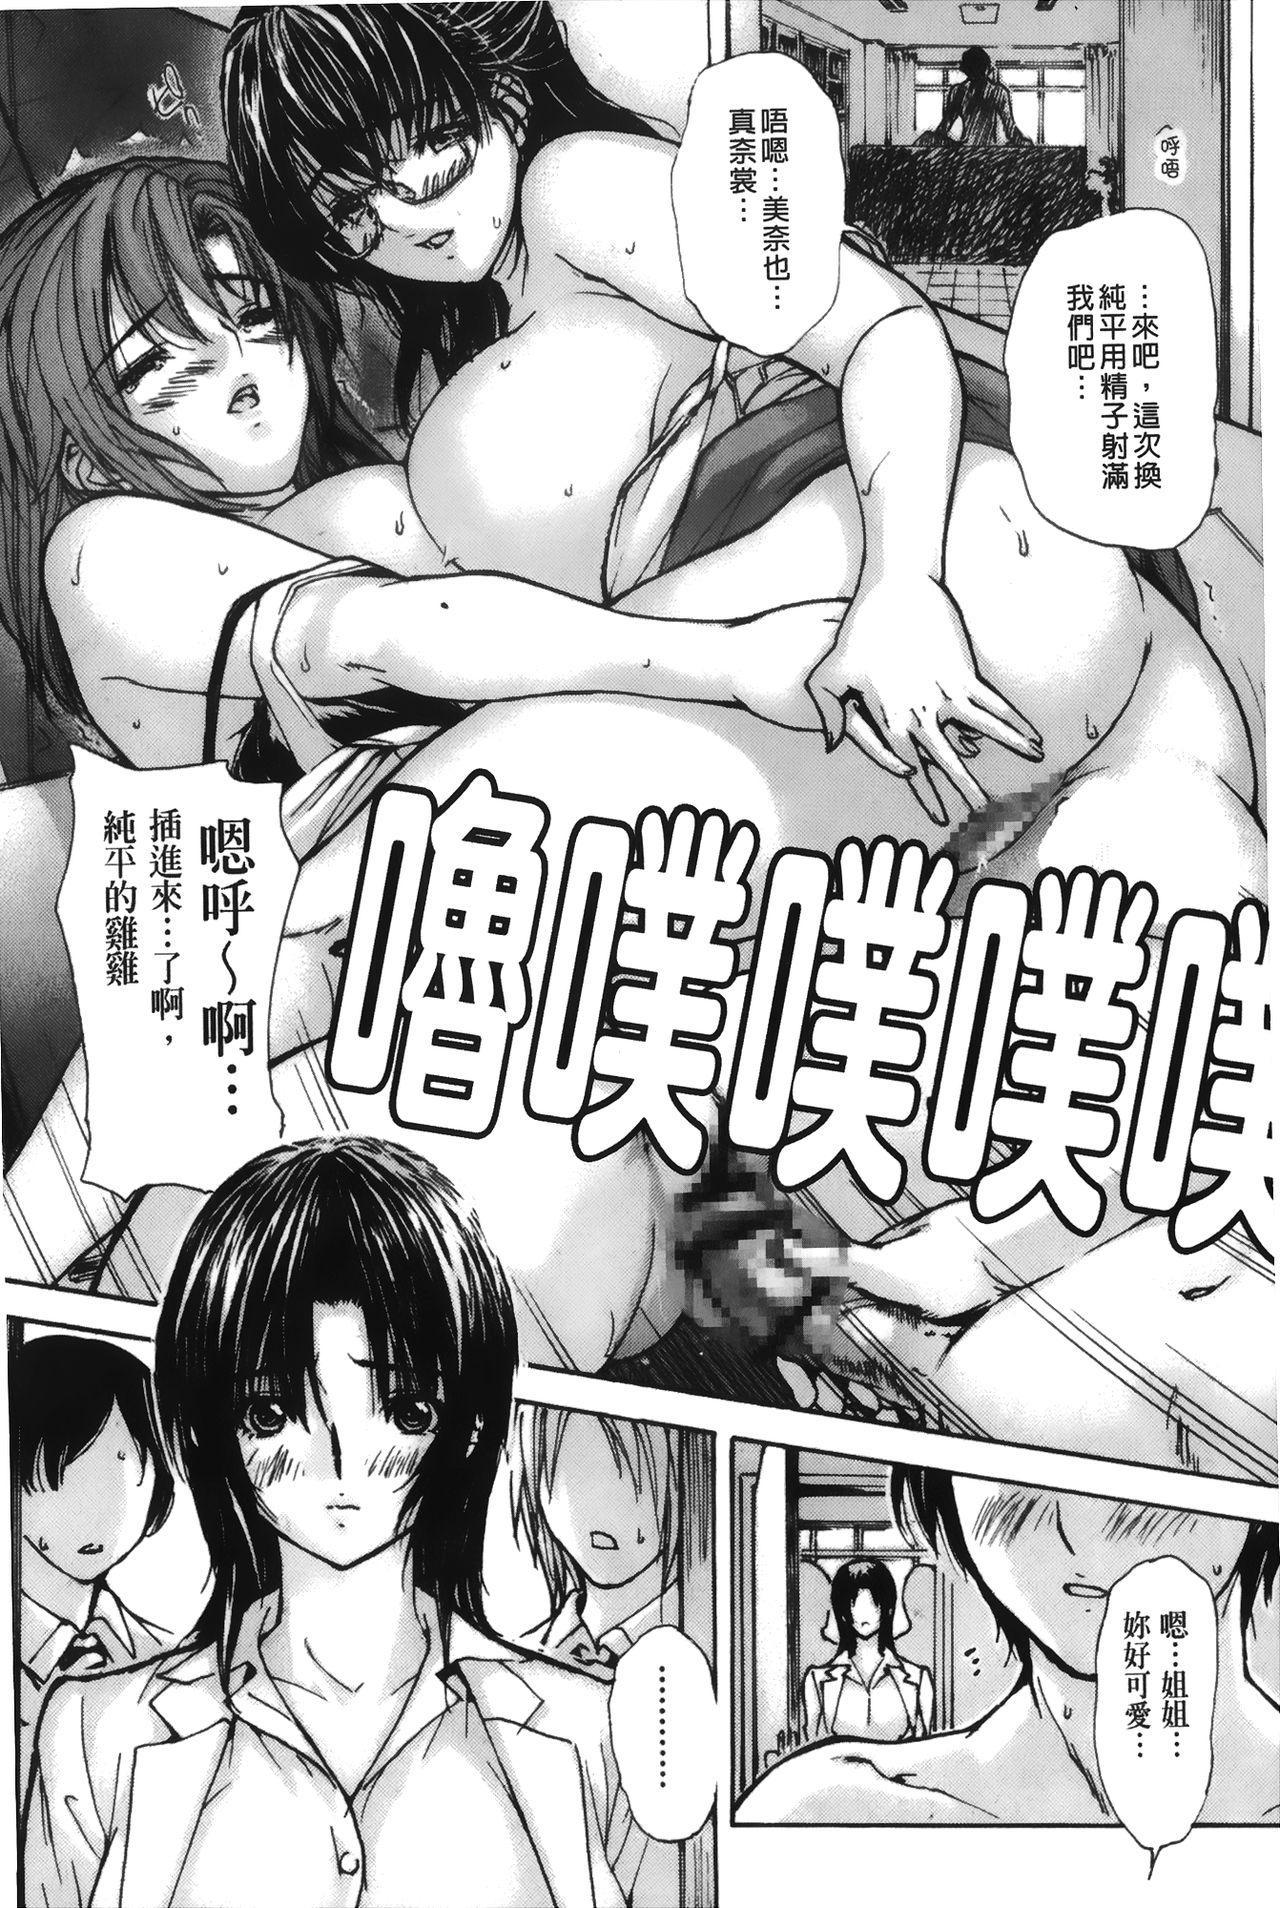 Tonari no Minano Sensei 4 | 隔壁的美奈乃老師 4 147